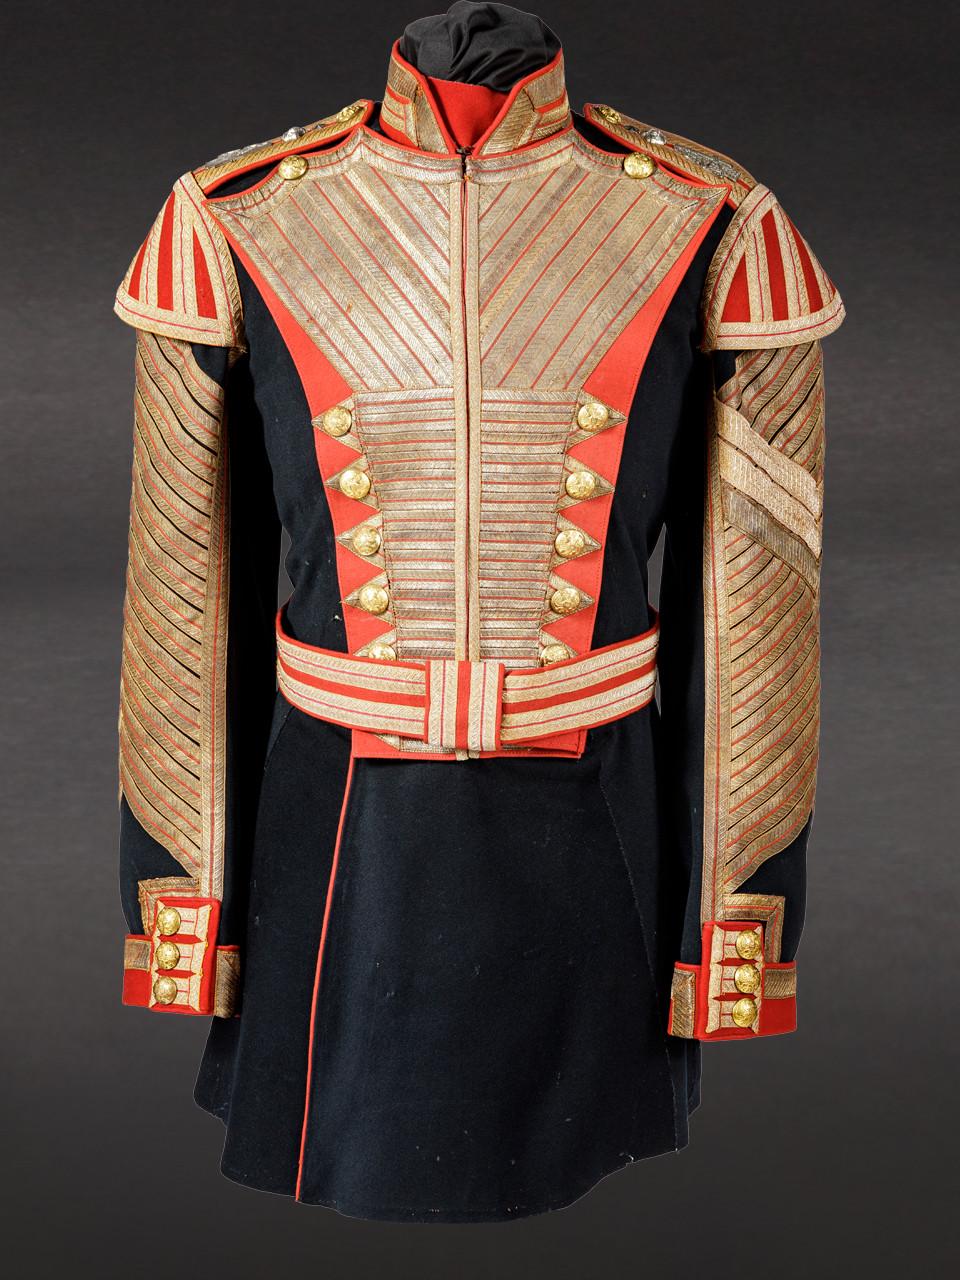 1280x960_Uniform